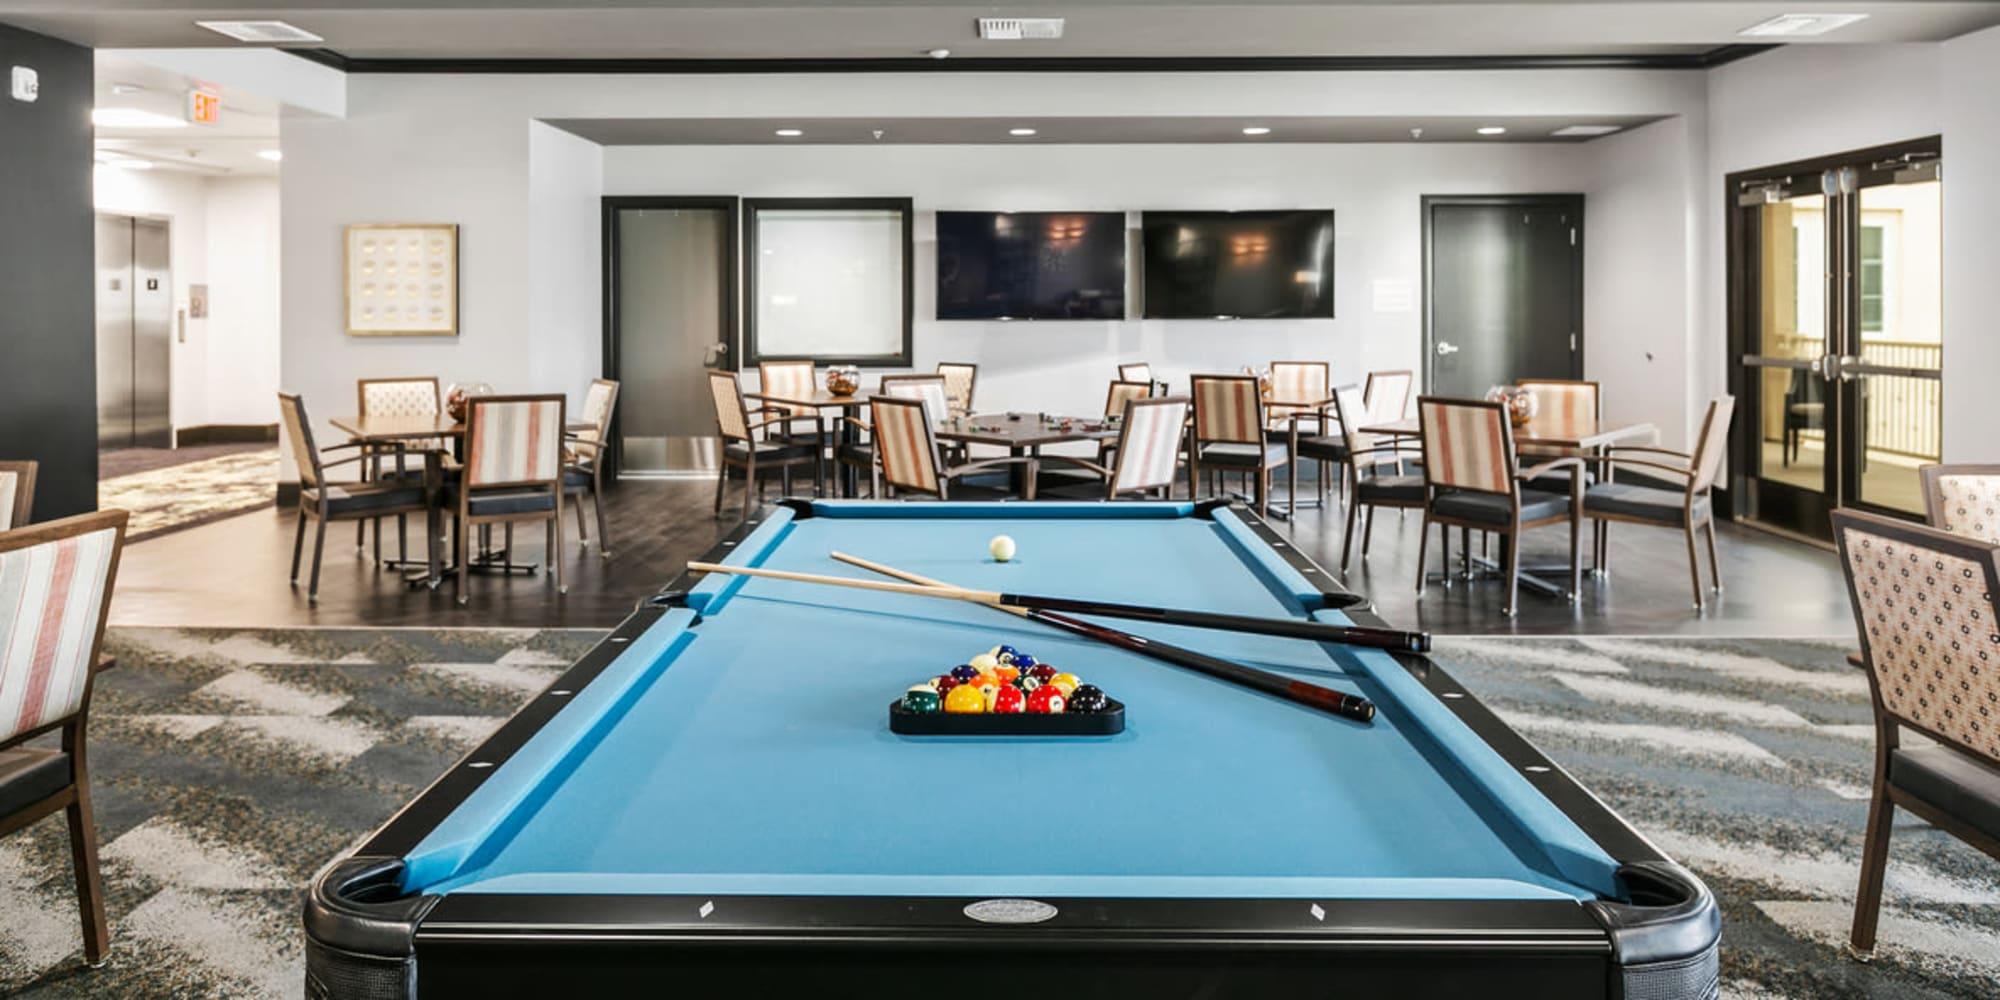 Senior living in Fallbrook, California at Estancia Senior Living Pool Table